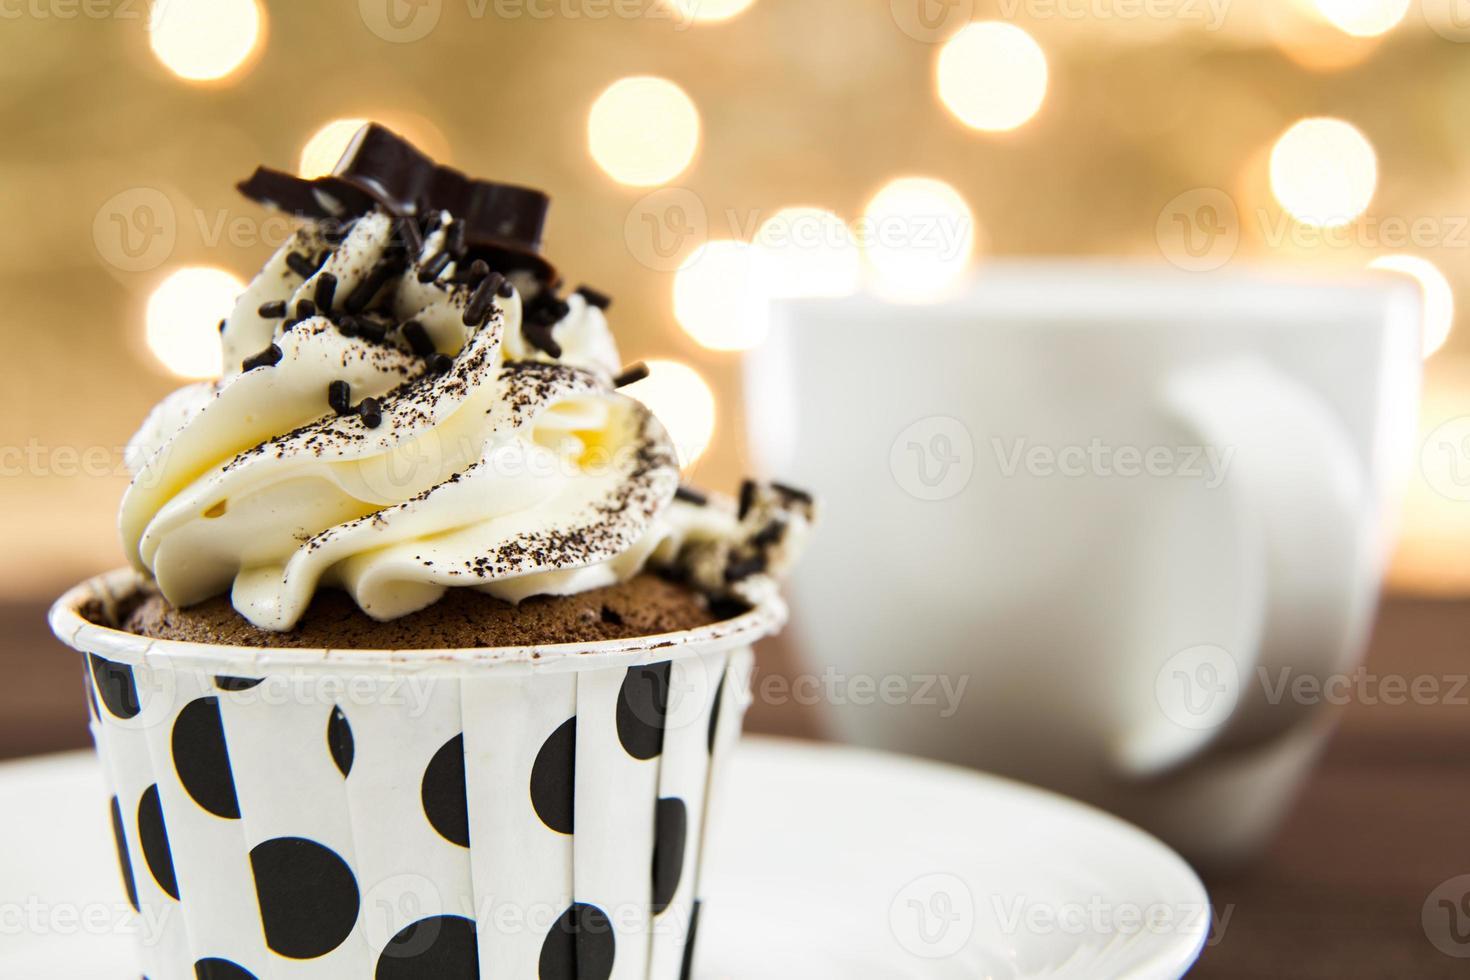 Tasty cupcake on lights background photo